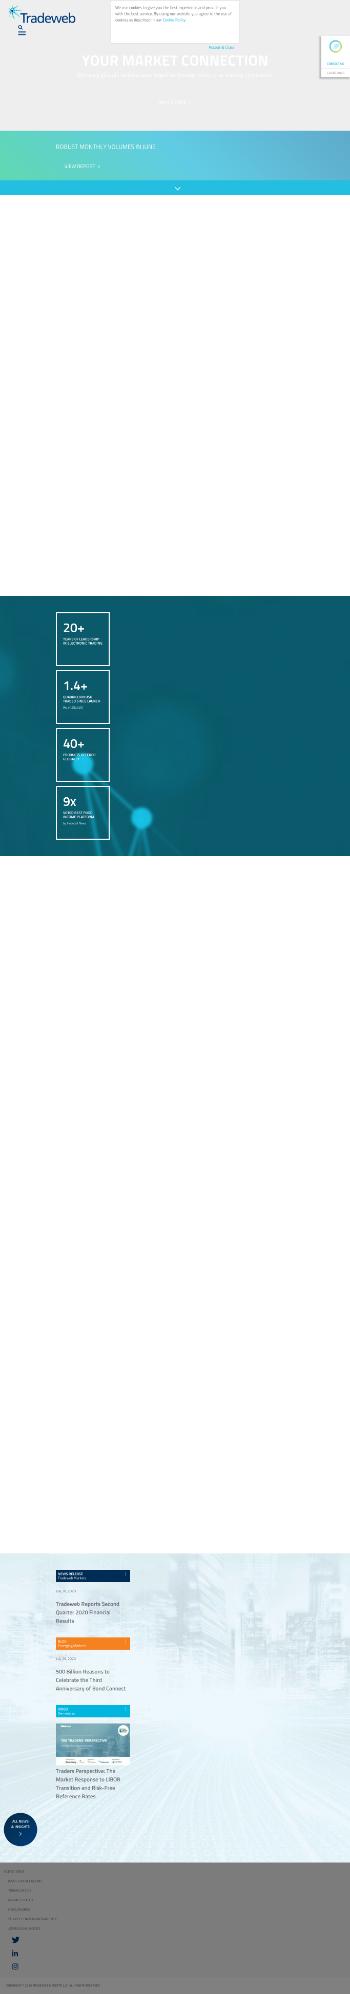 Tradeweb Markets Inc. Website Screenshot